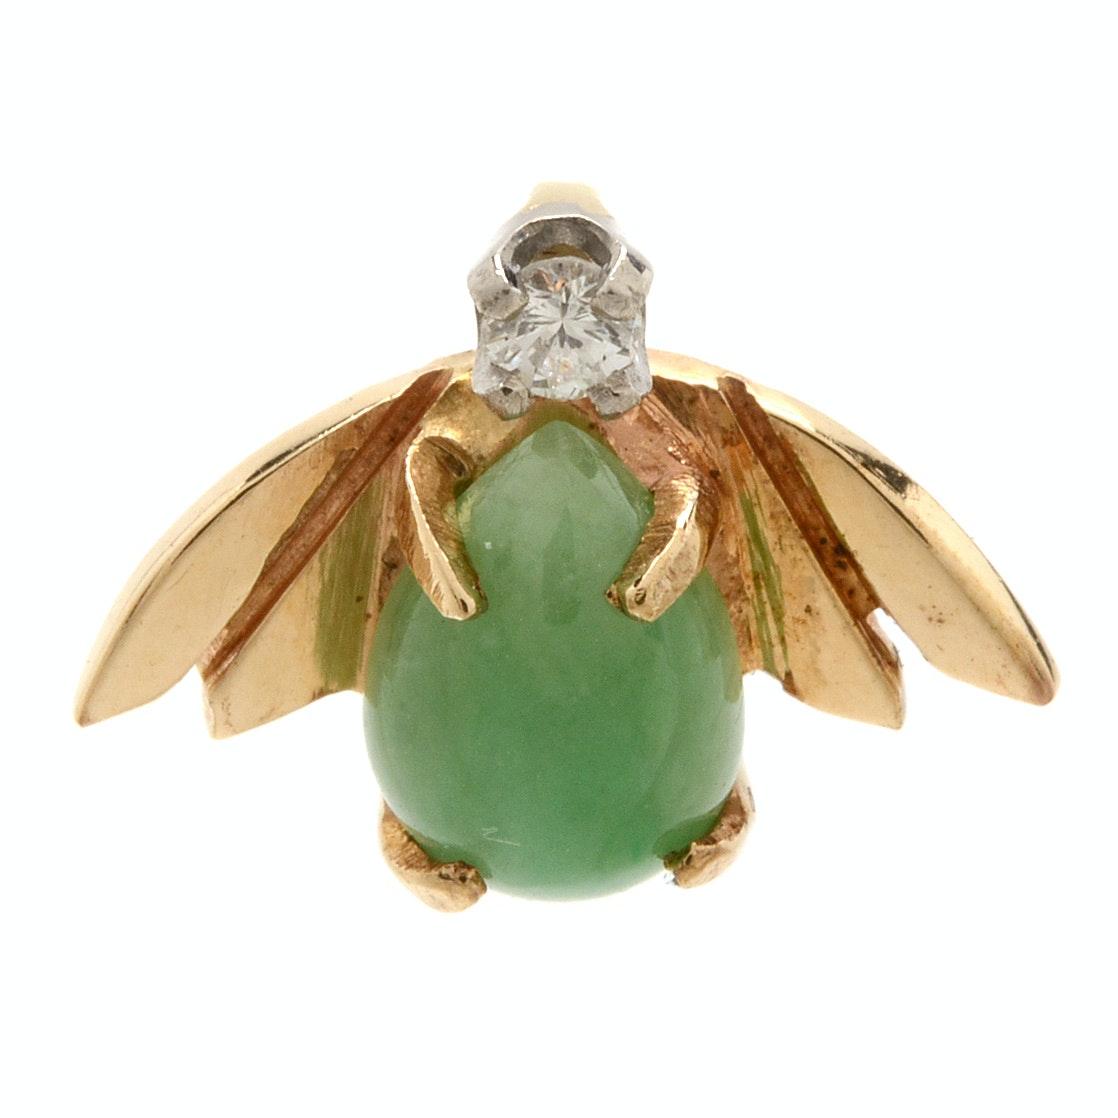 14K Yellow Gold Diamond and Jadeite Pendant